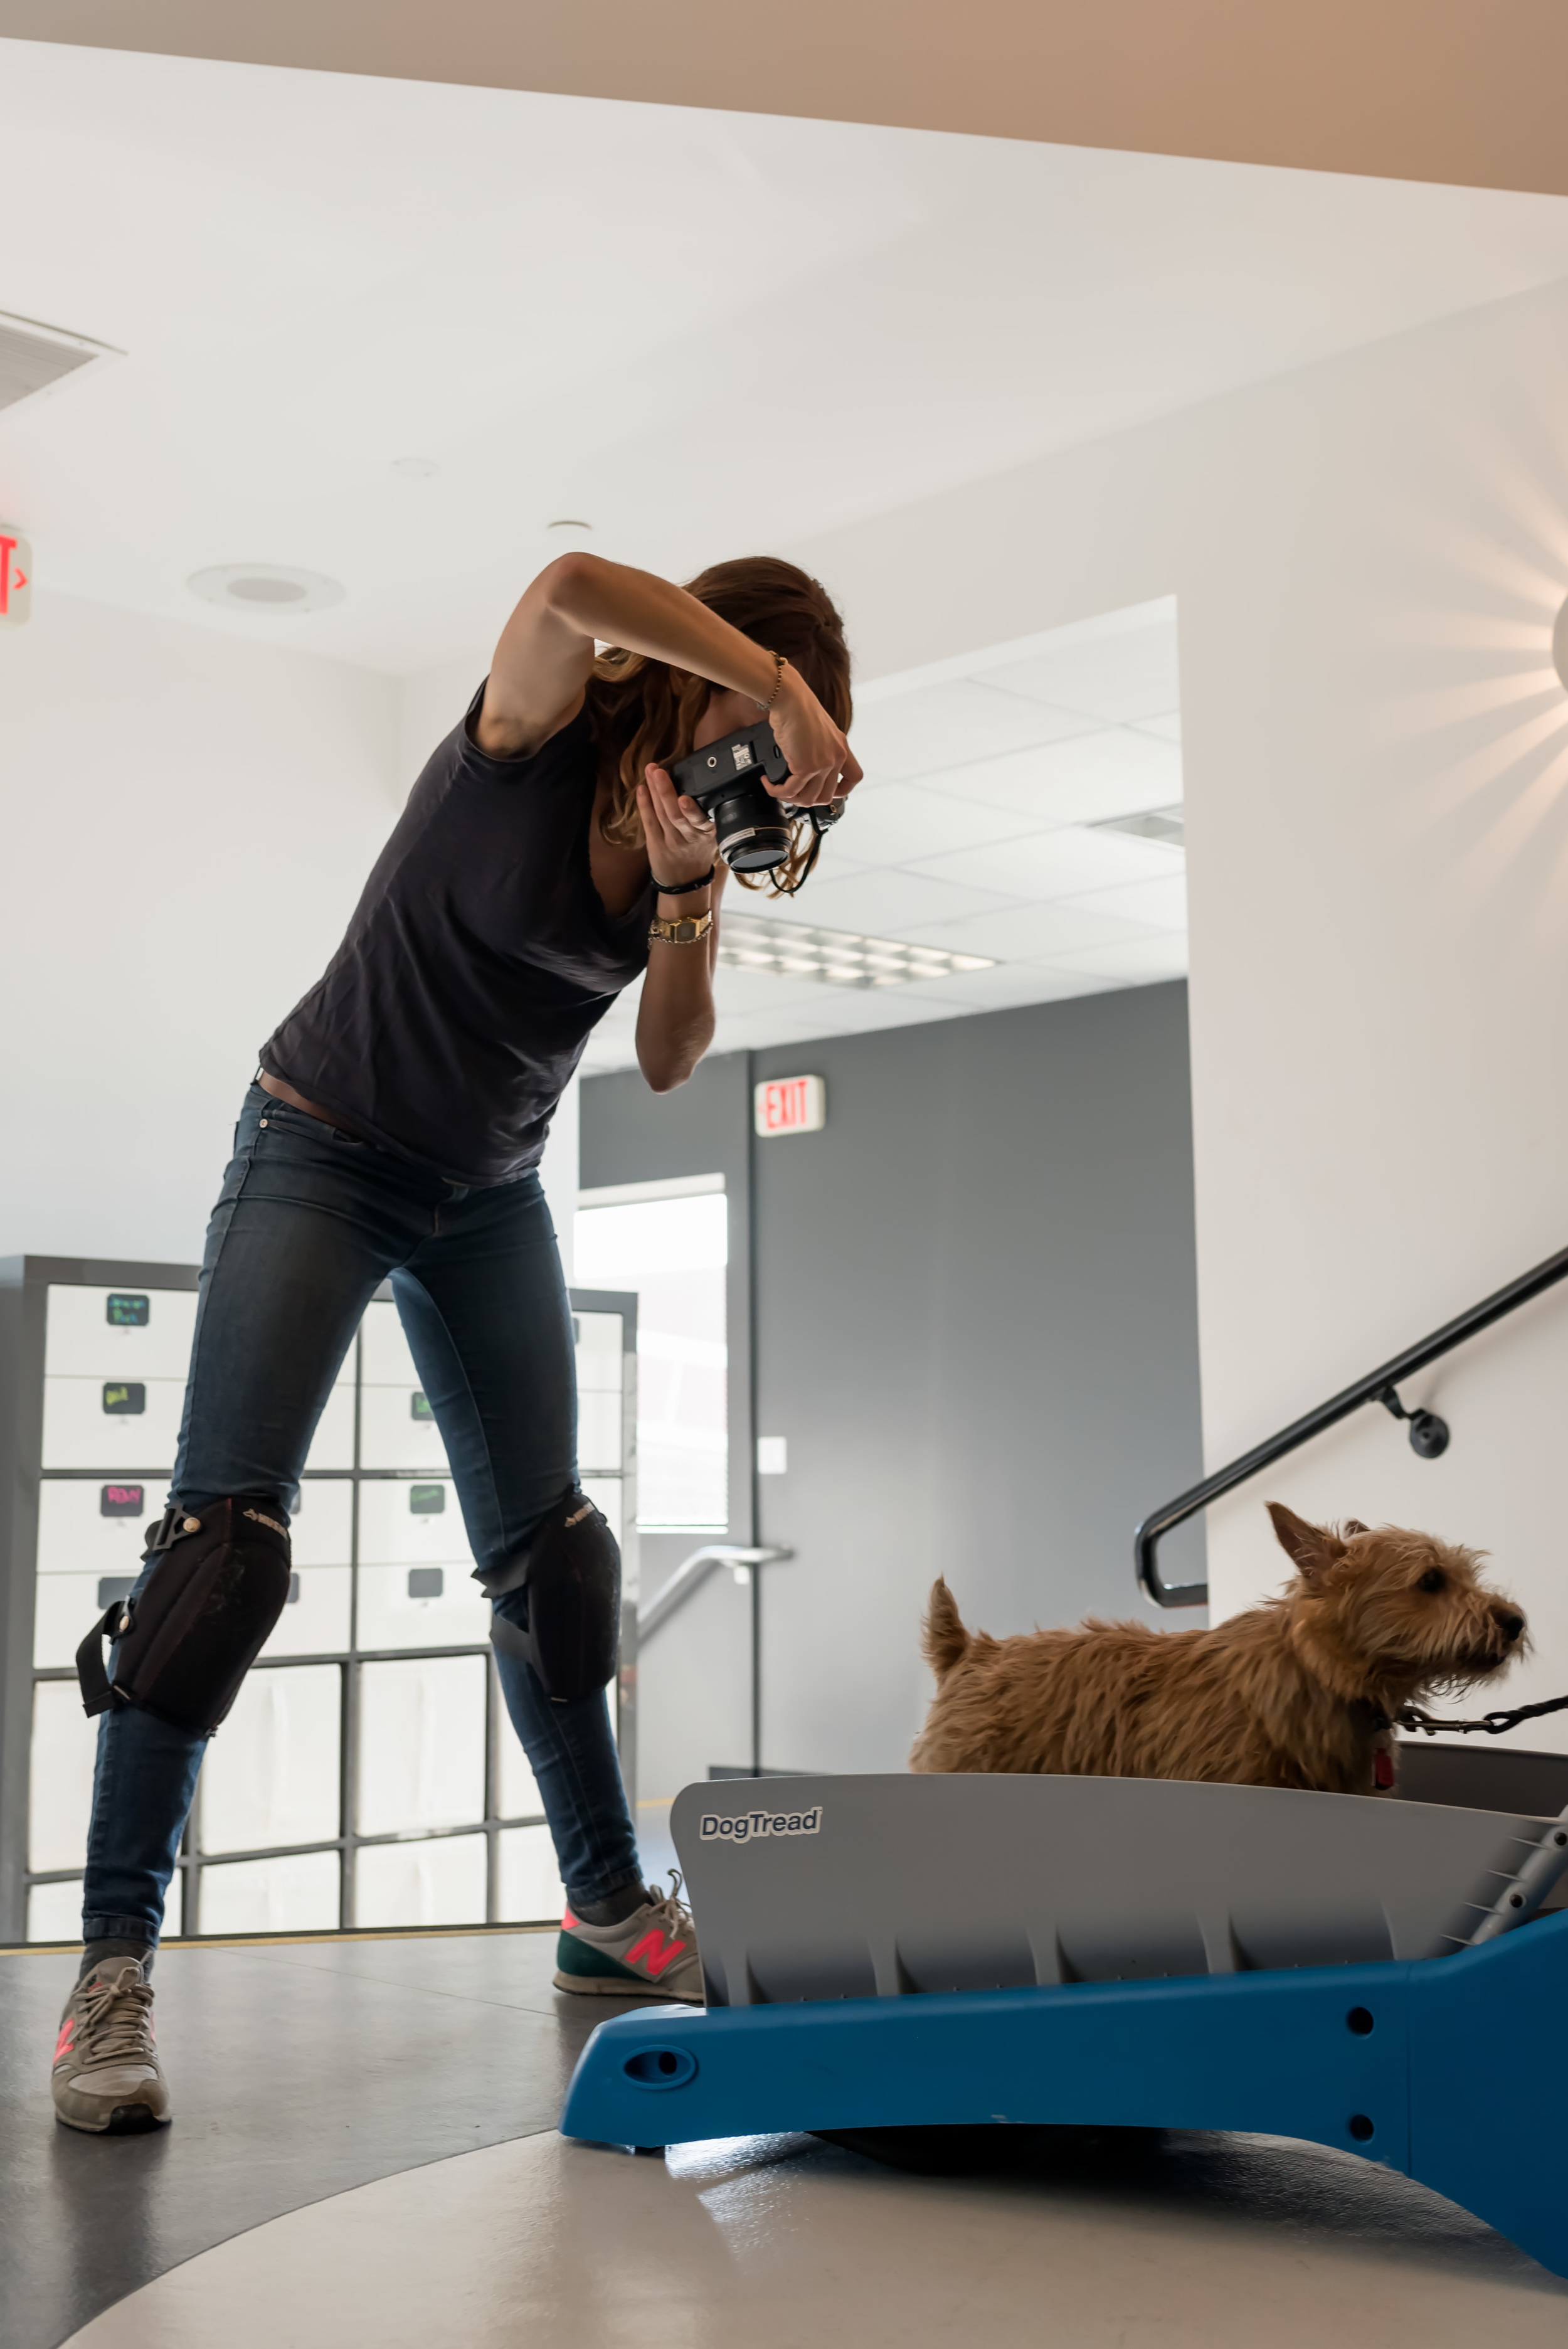 behind-the-scenes-dog-photographer-working-on-set-3.jpg